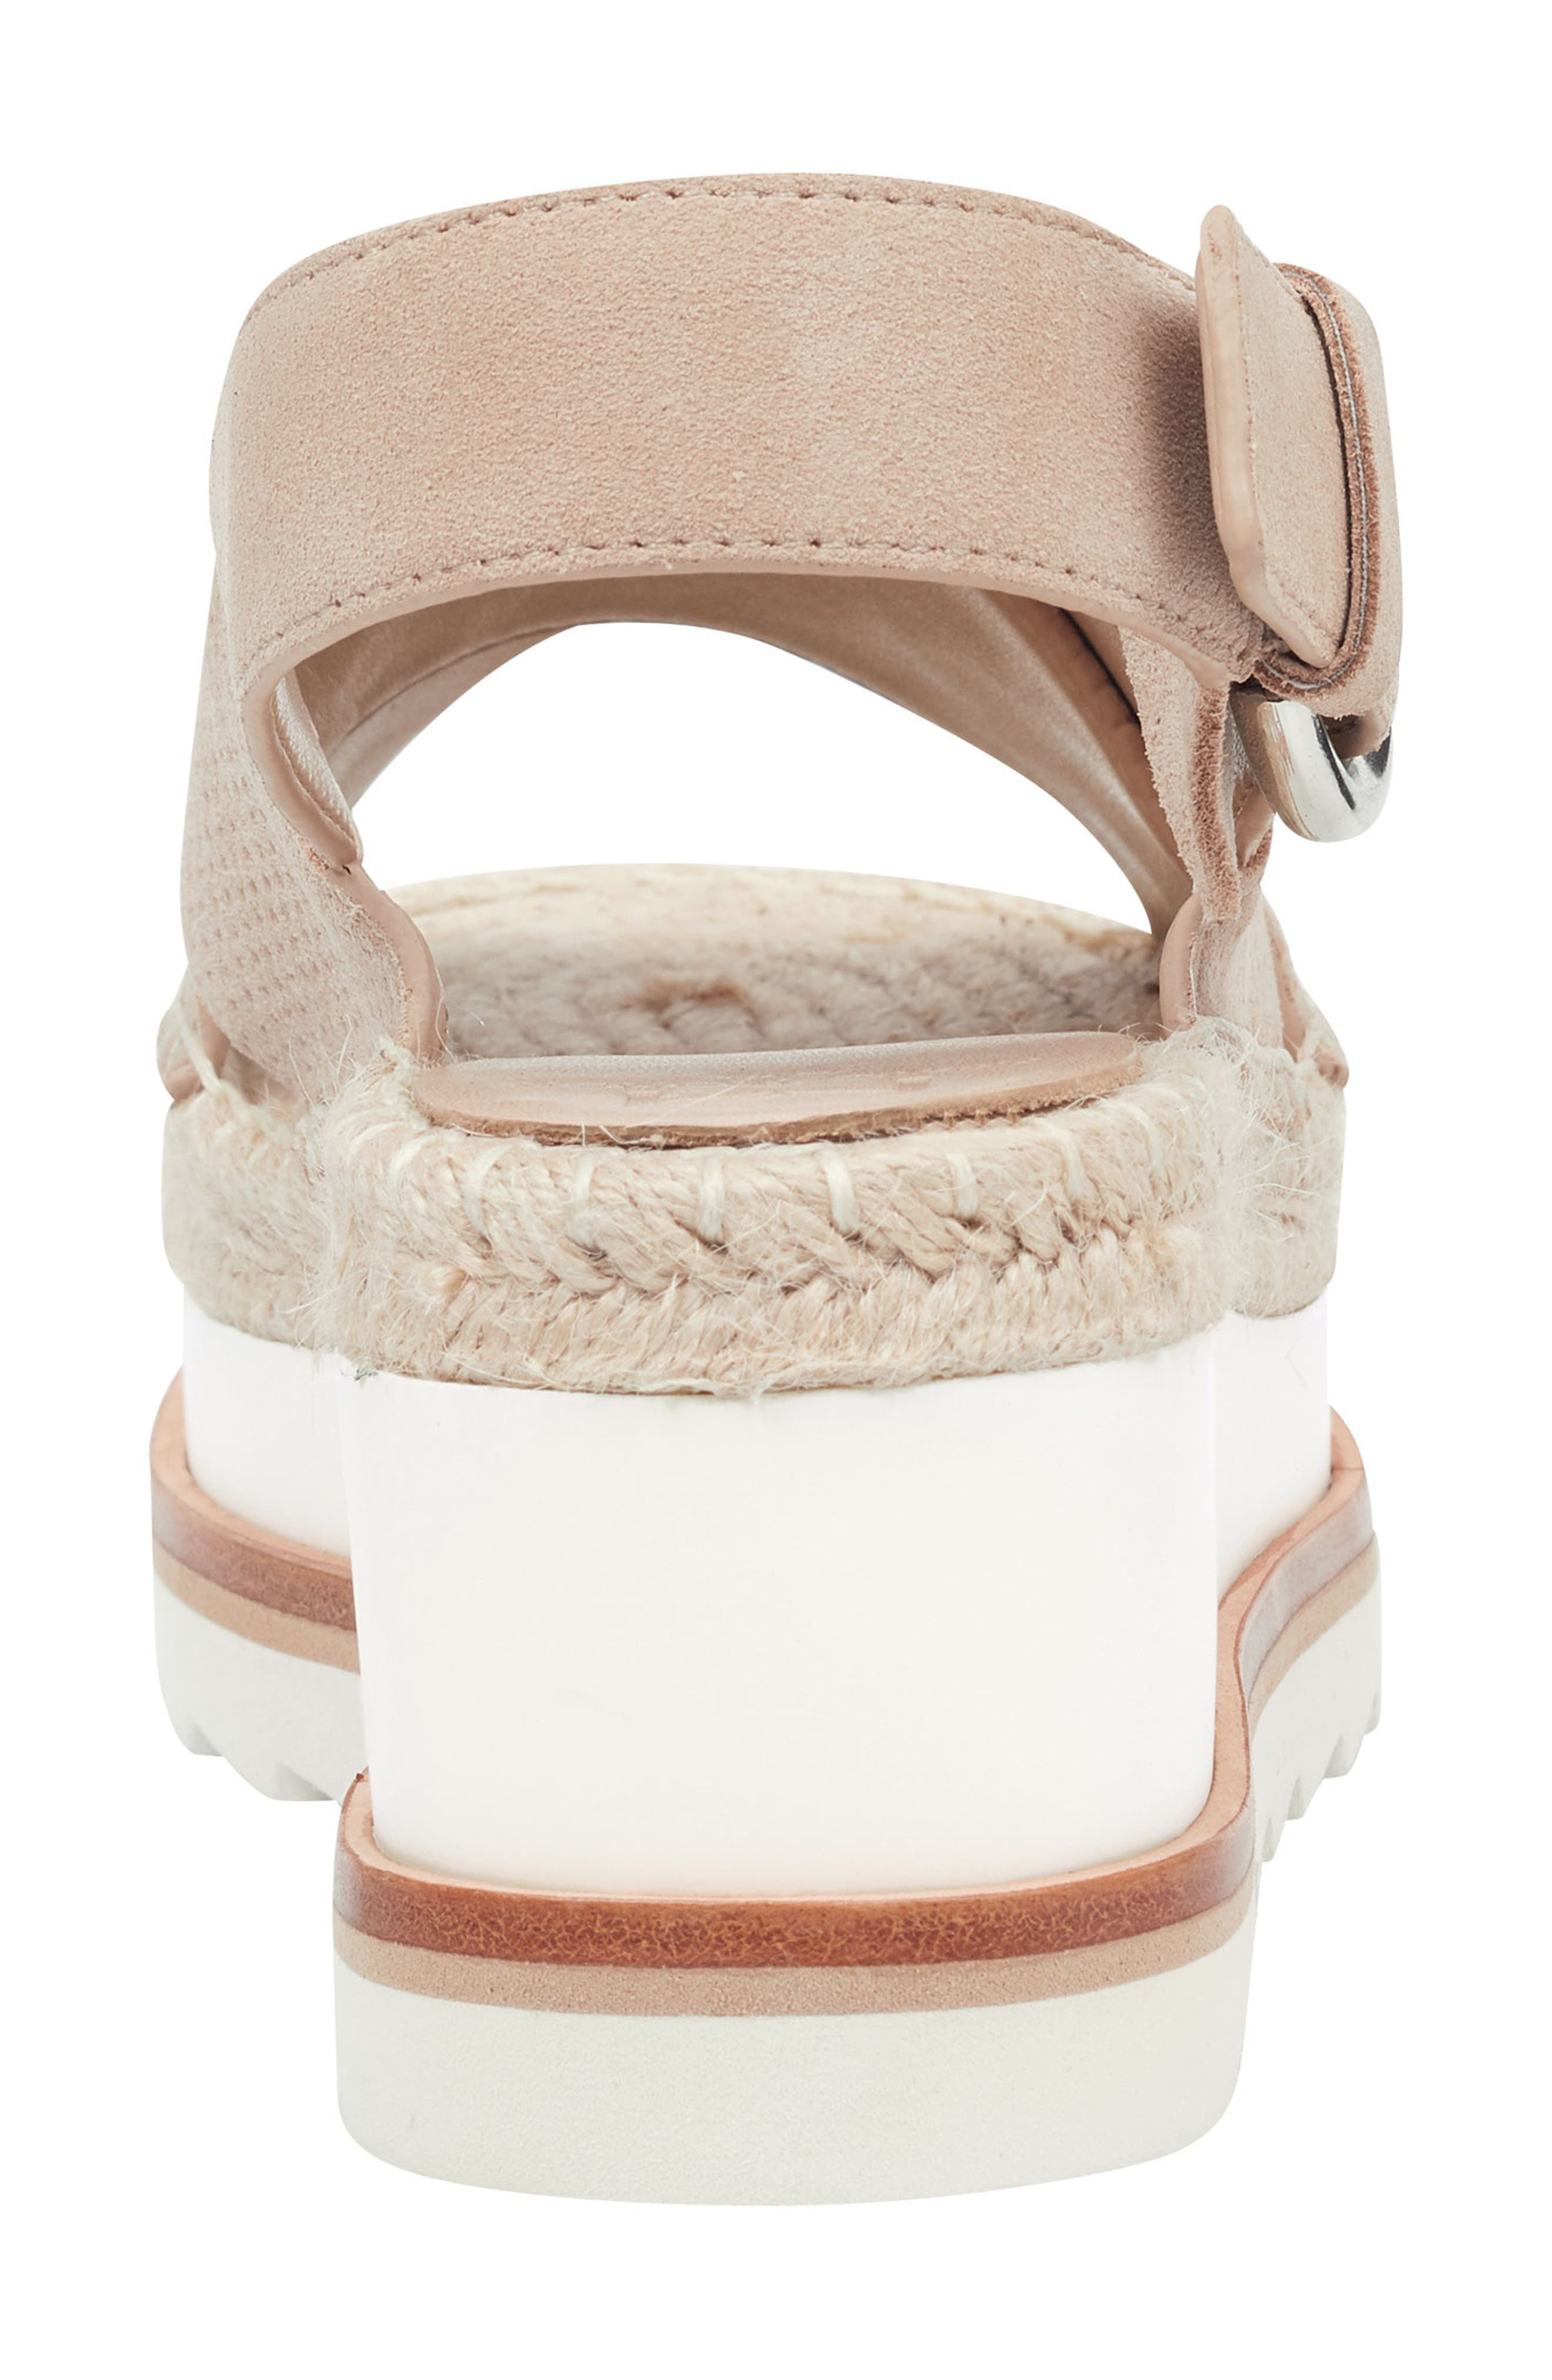 Gellyn Slingback Sandal,                             Alternate thumbnail 7, color,                             LIGHT NATURAL SUEDE